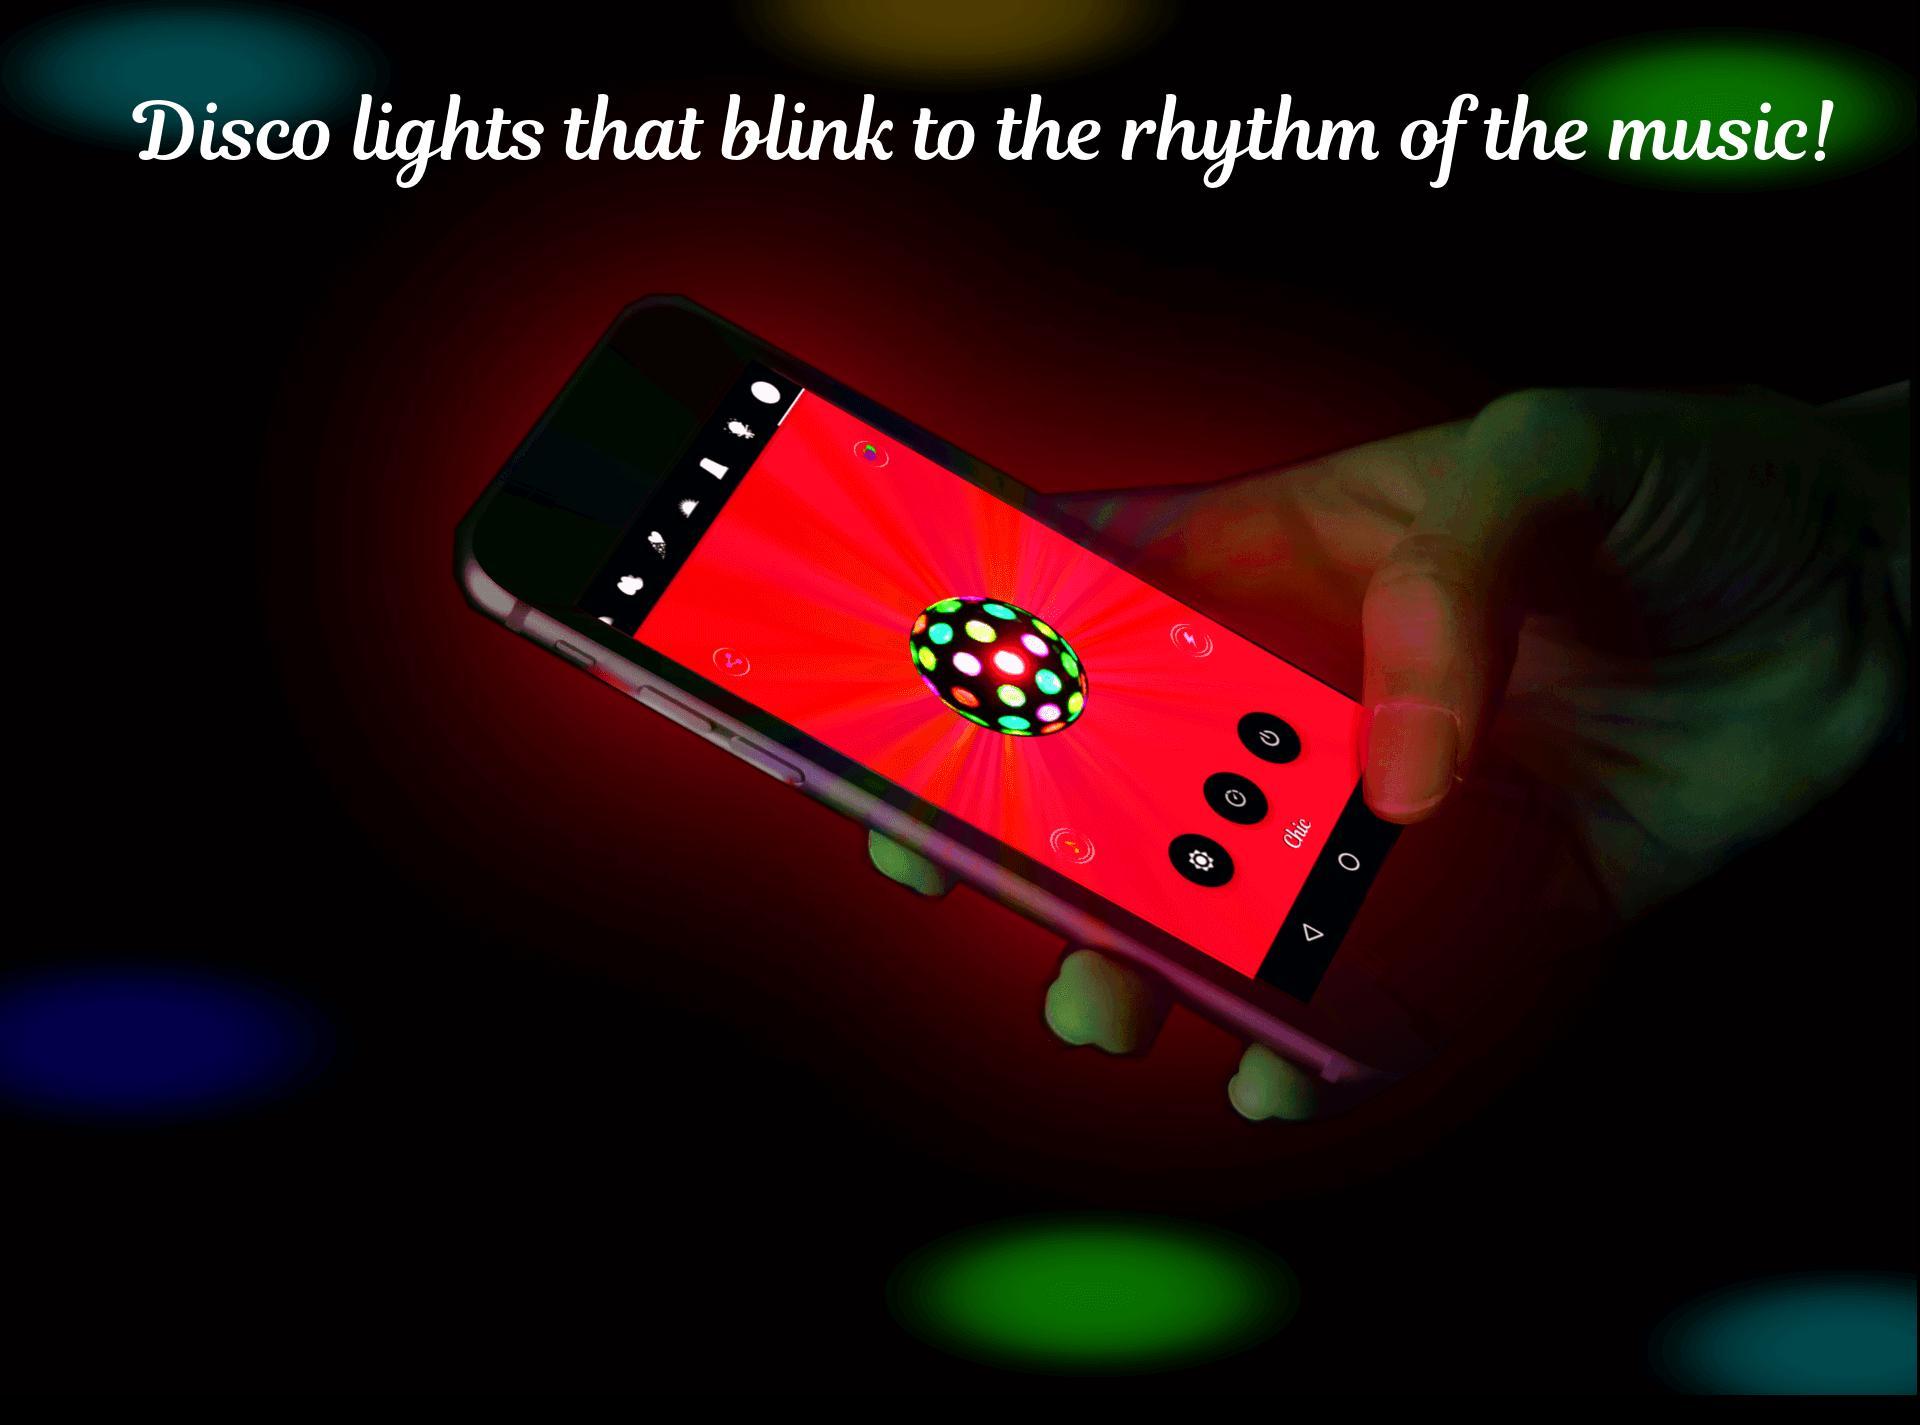 Music Light: Flashlight, Strobe & Music Visualizer for Android - APK